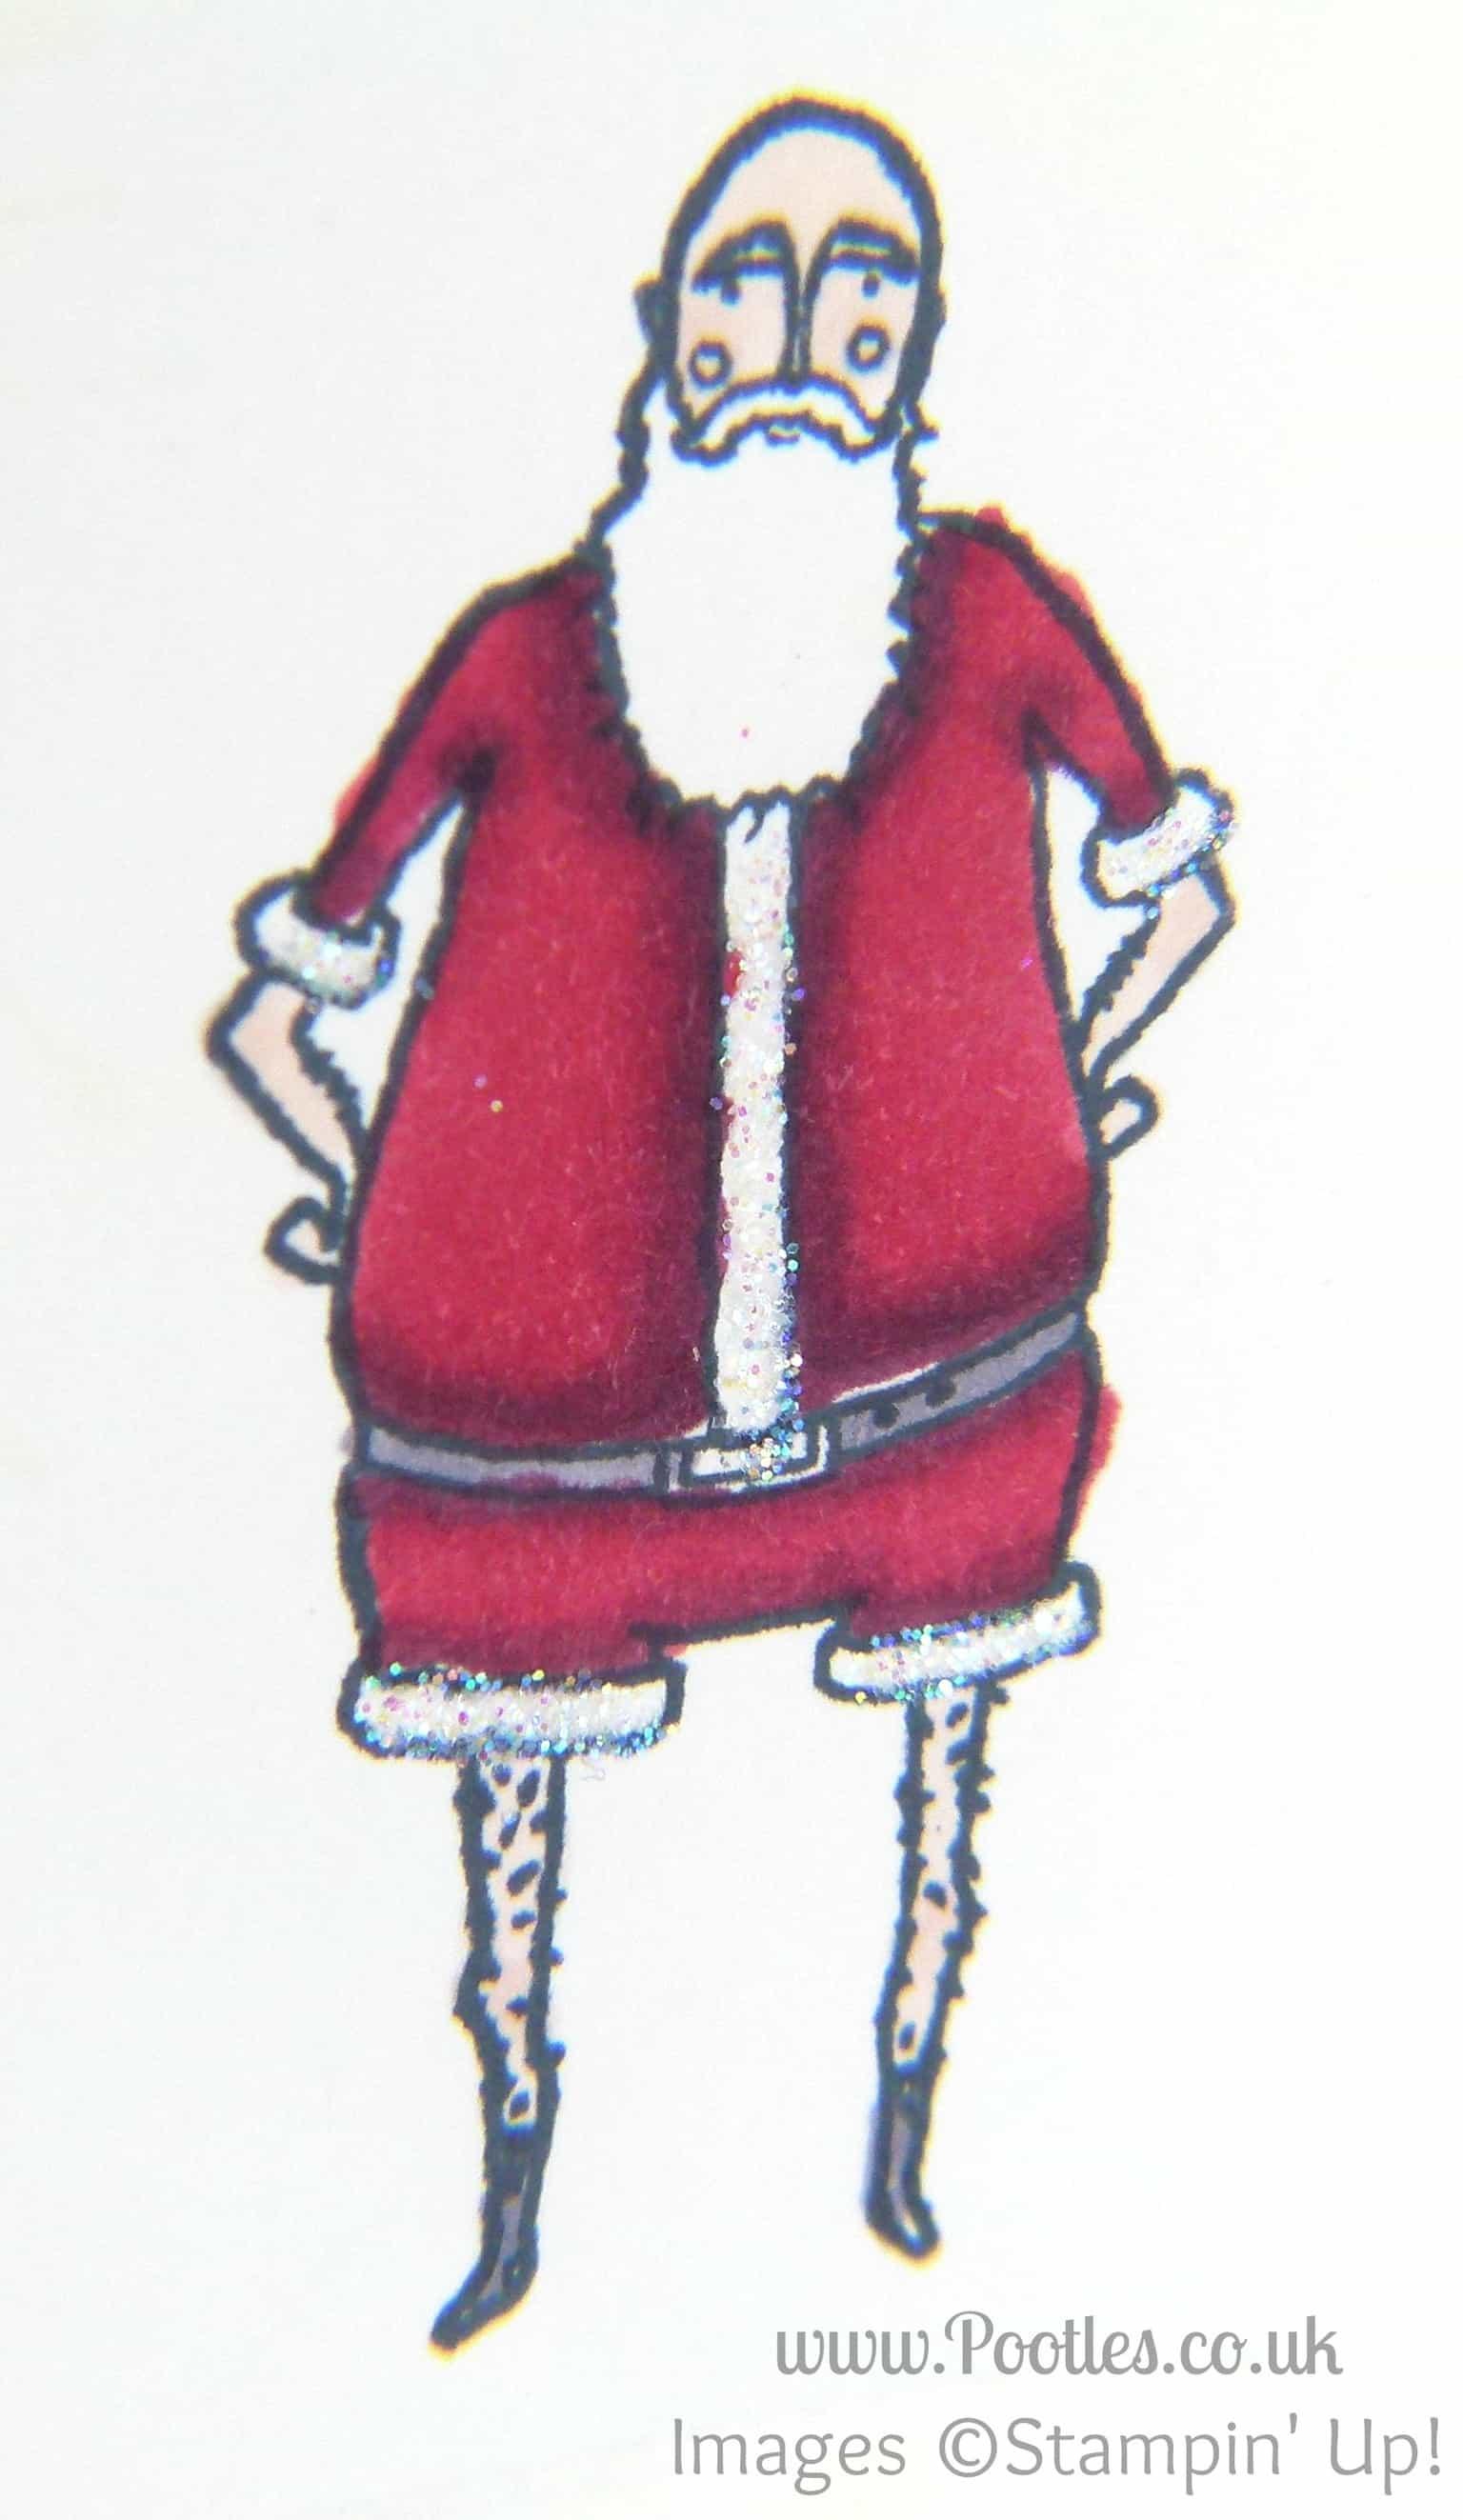 Crazy Santa with Stampin' Up! Visions of Santa and Blendabilities